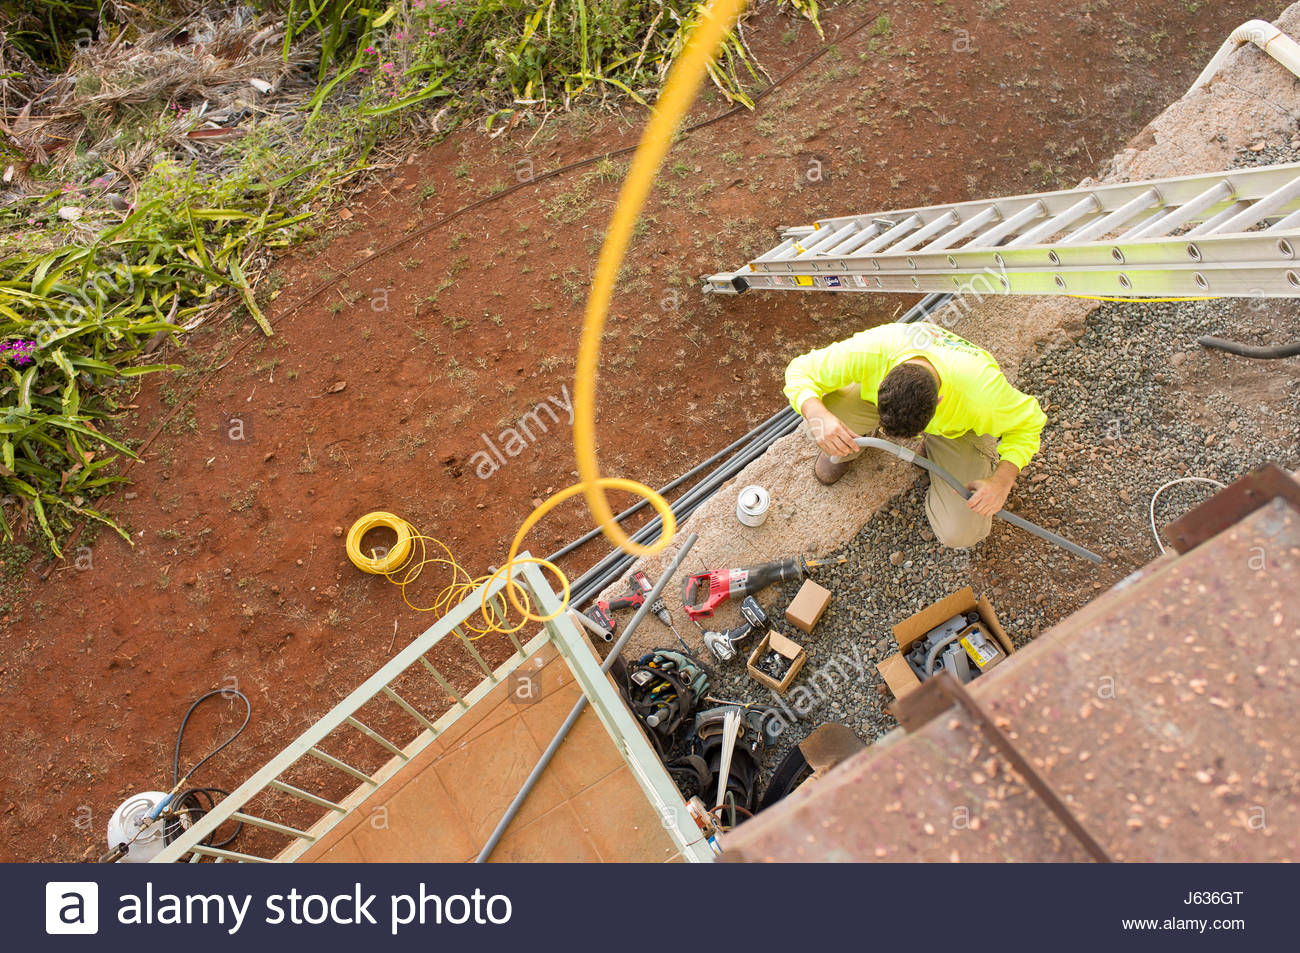 Elektriker, Bau einer Verdrahtung Kabelkanal aus Kunststoff PVC Rohr ...